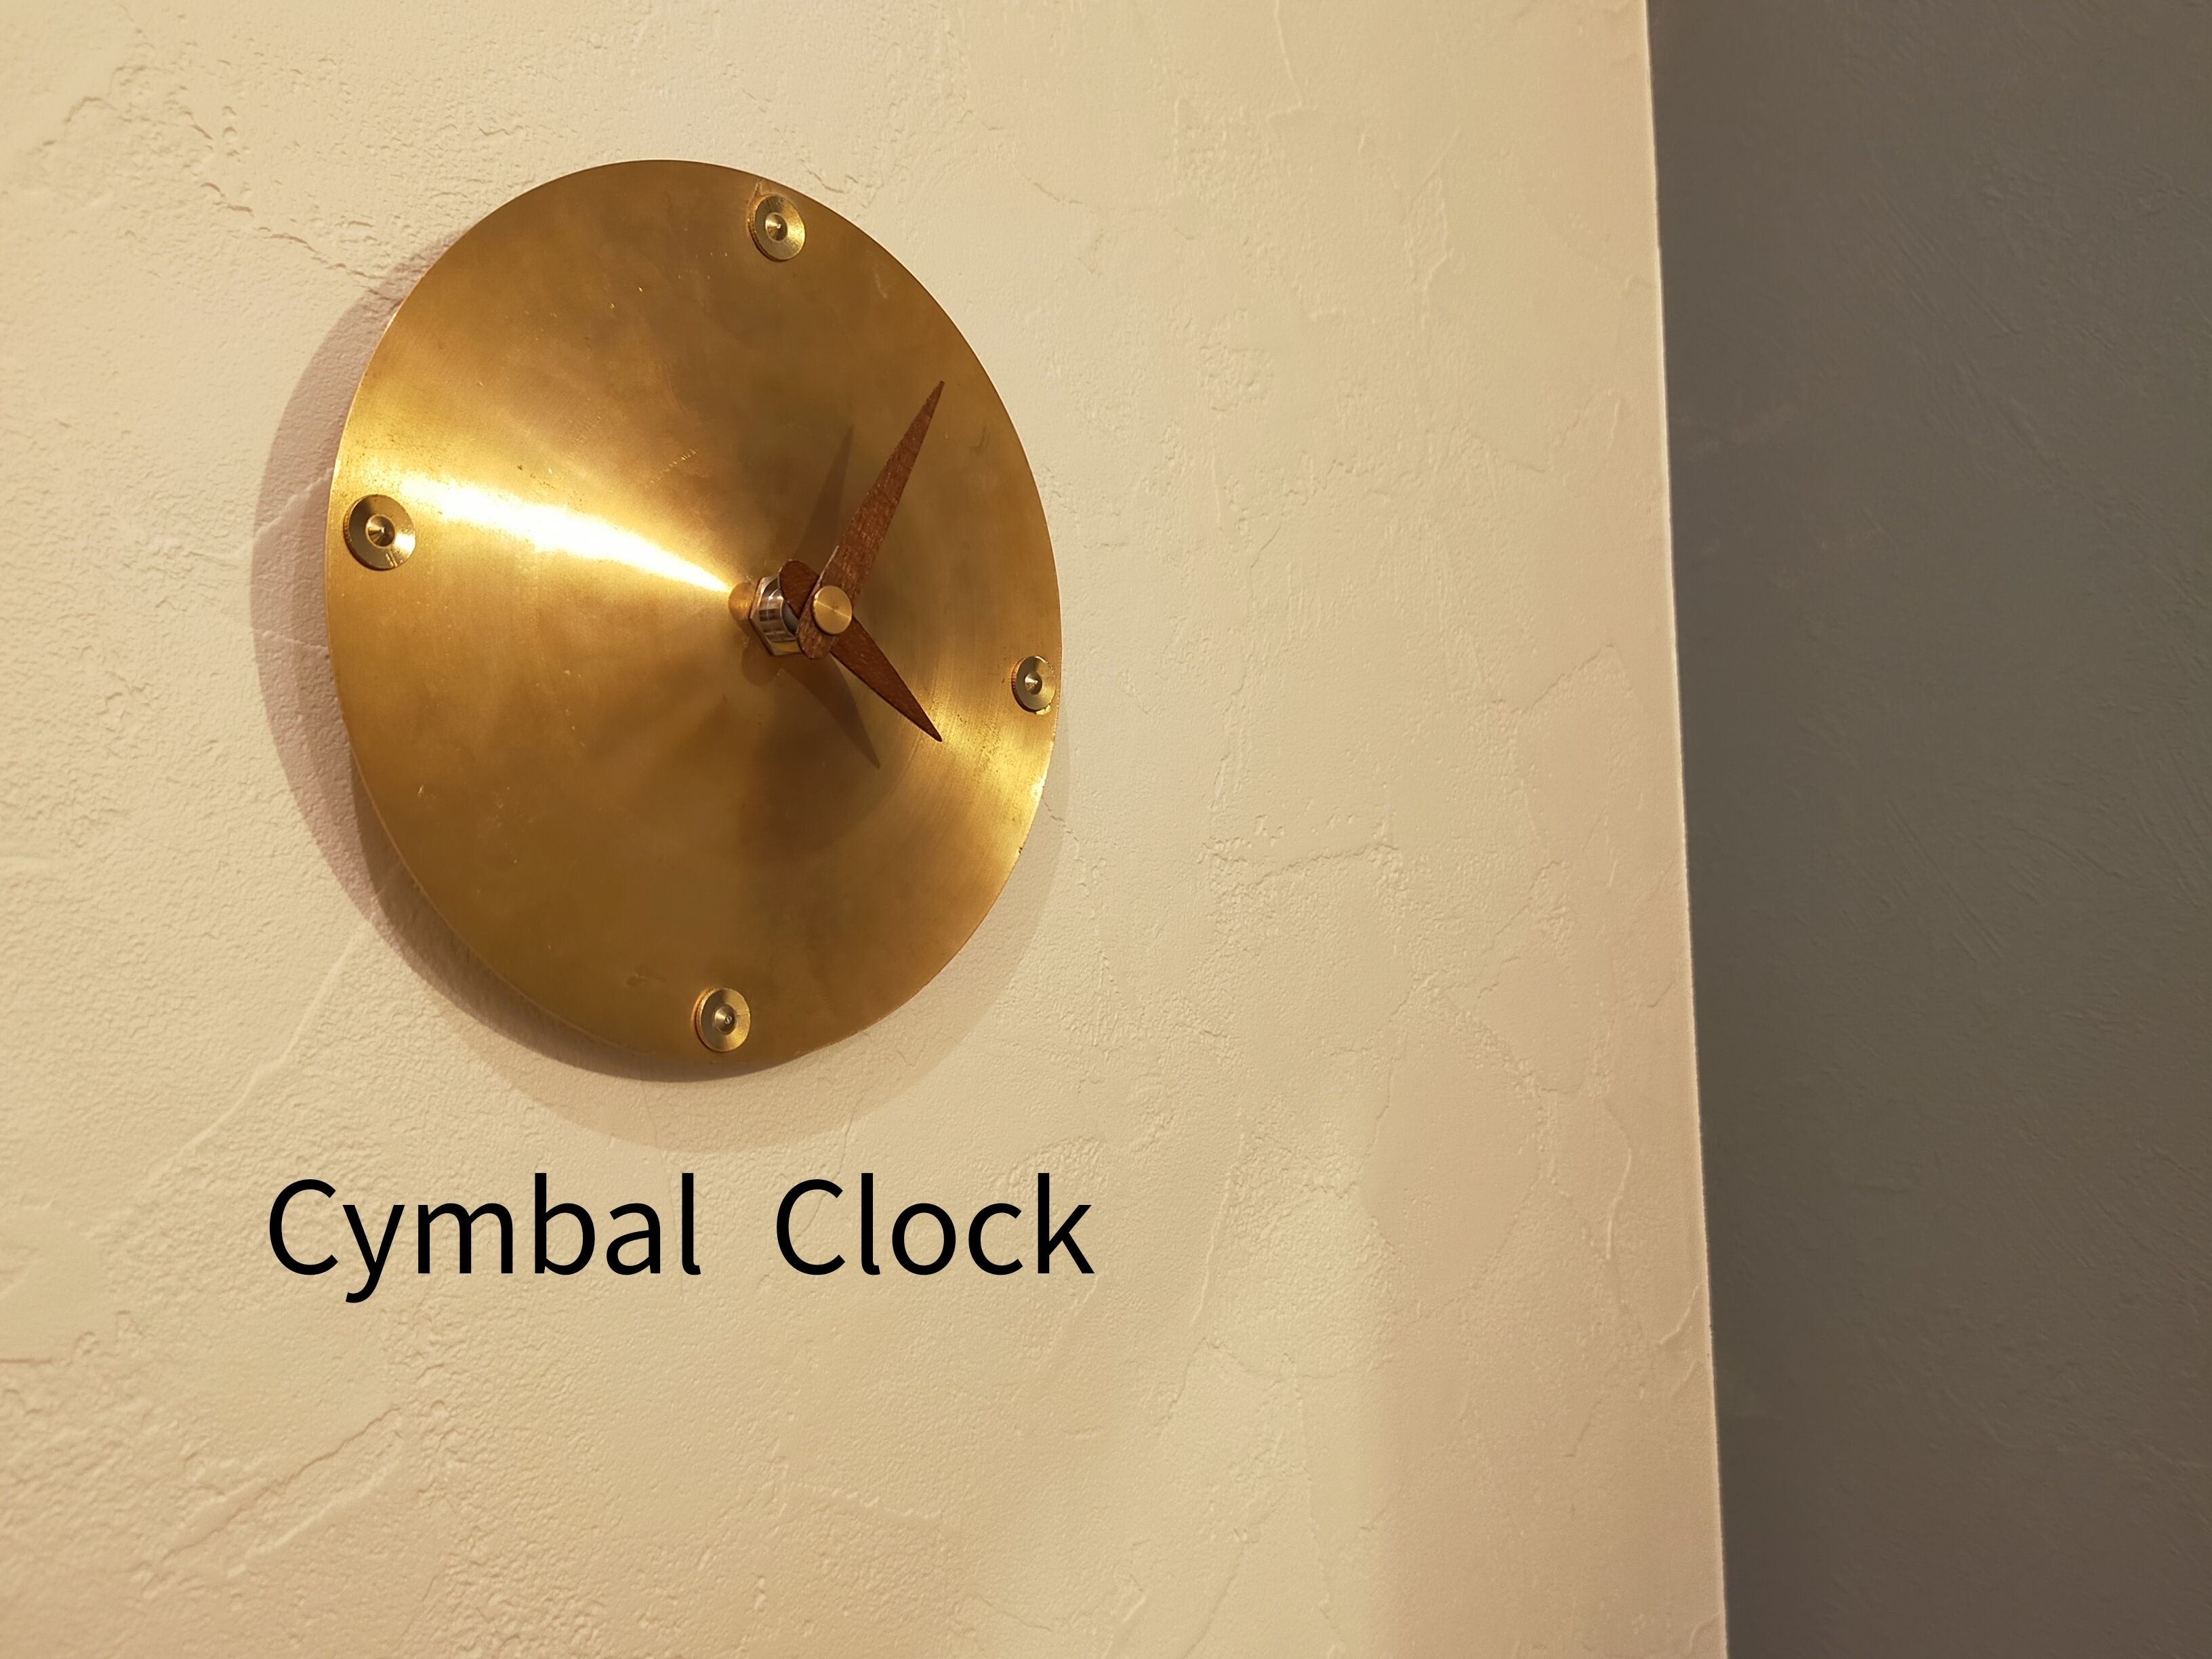 Cymbal Clock(シンバル×壁掛け時計)